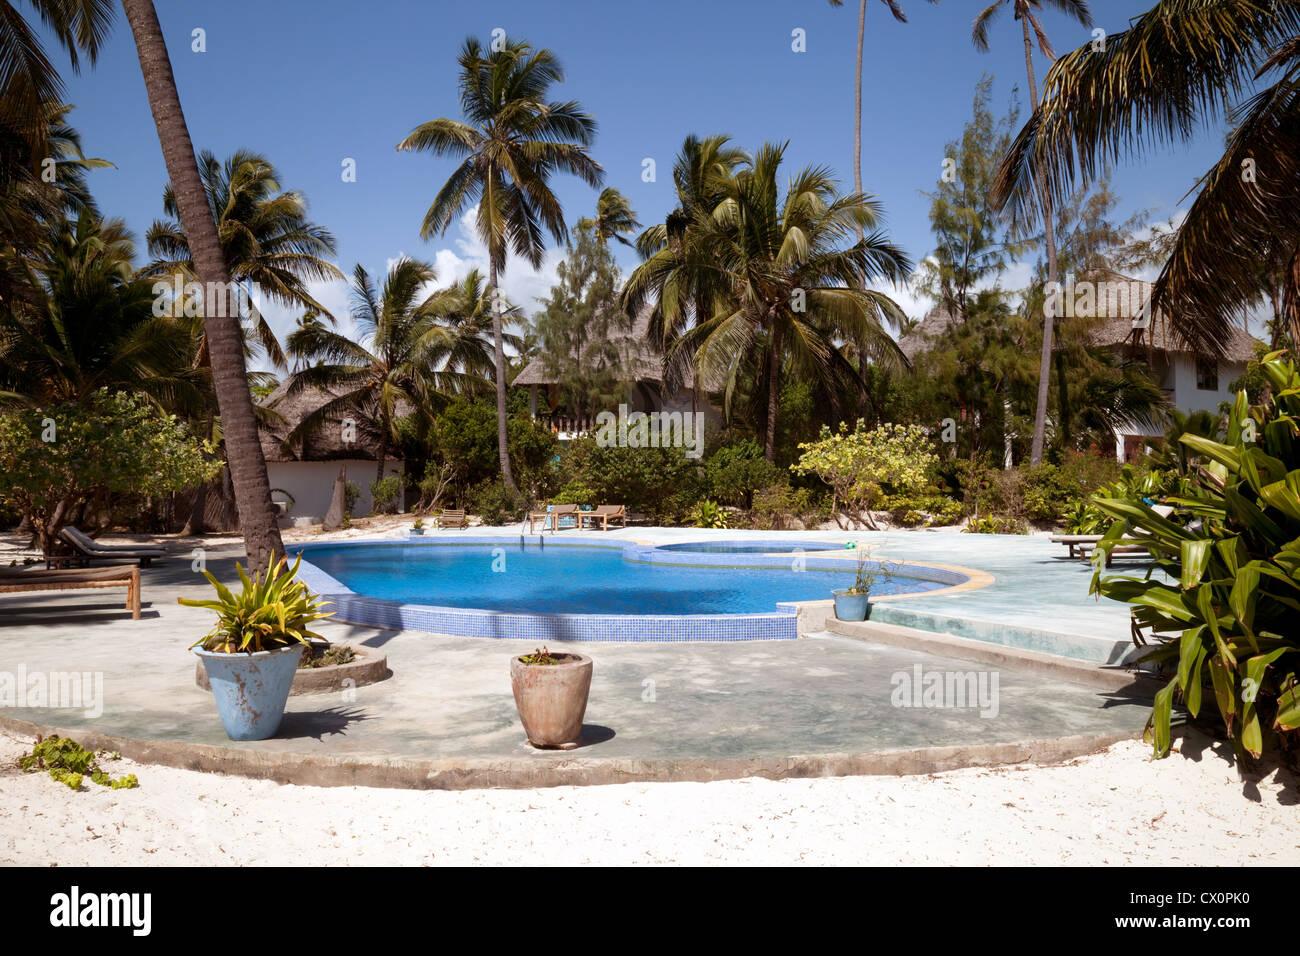 The Luxury boutique Echo Beach Hotel, Zanzibar, Tanzania Africa - Stock Image